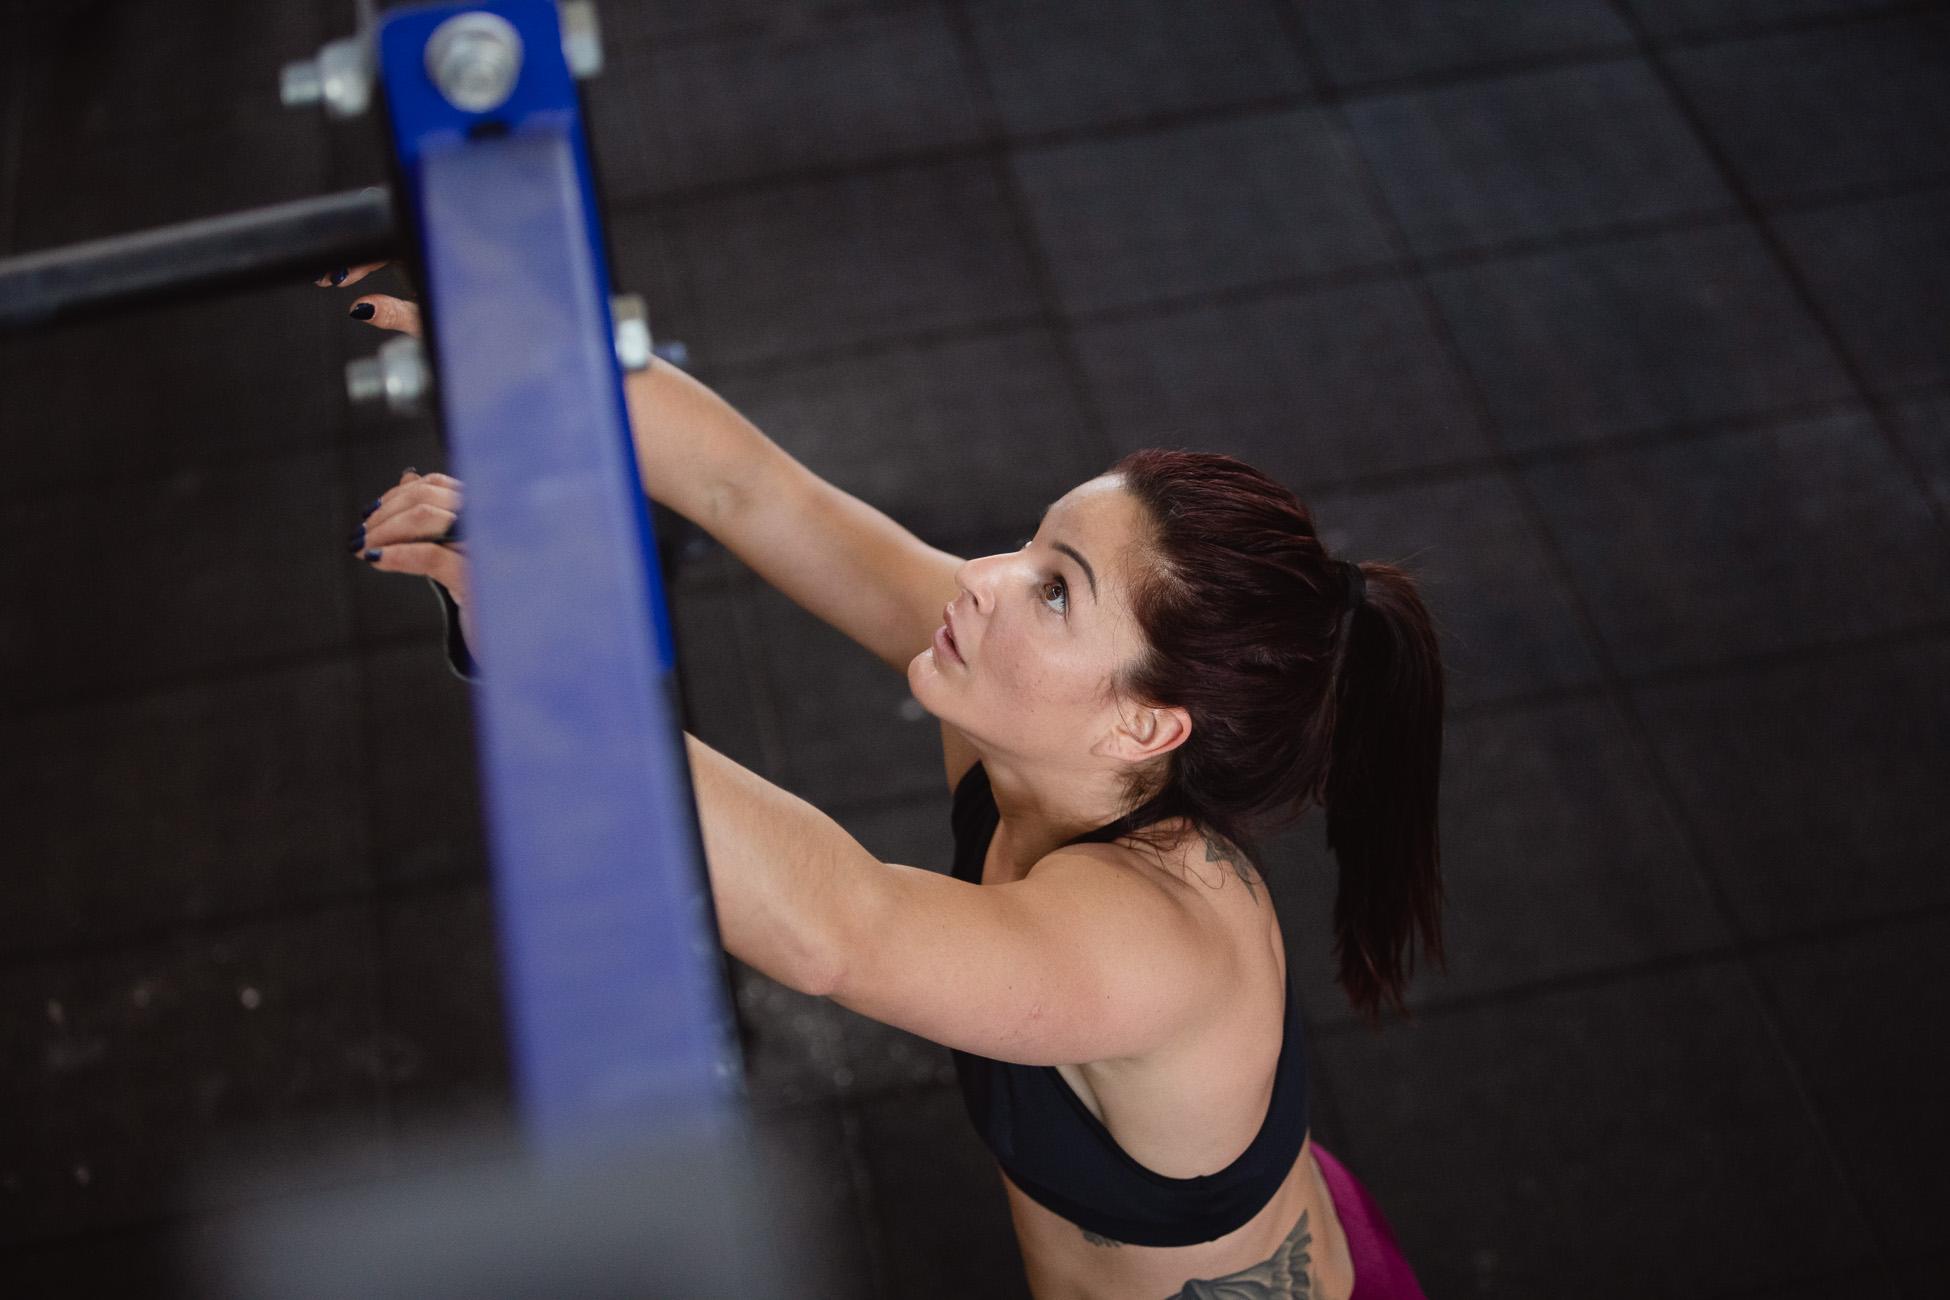 crossfit-games-open-fitness-lifestyle-desporto-atleta-fotografia-004.jpg